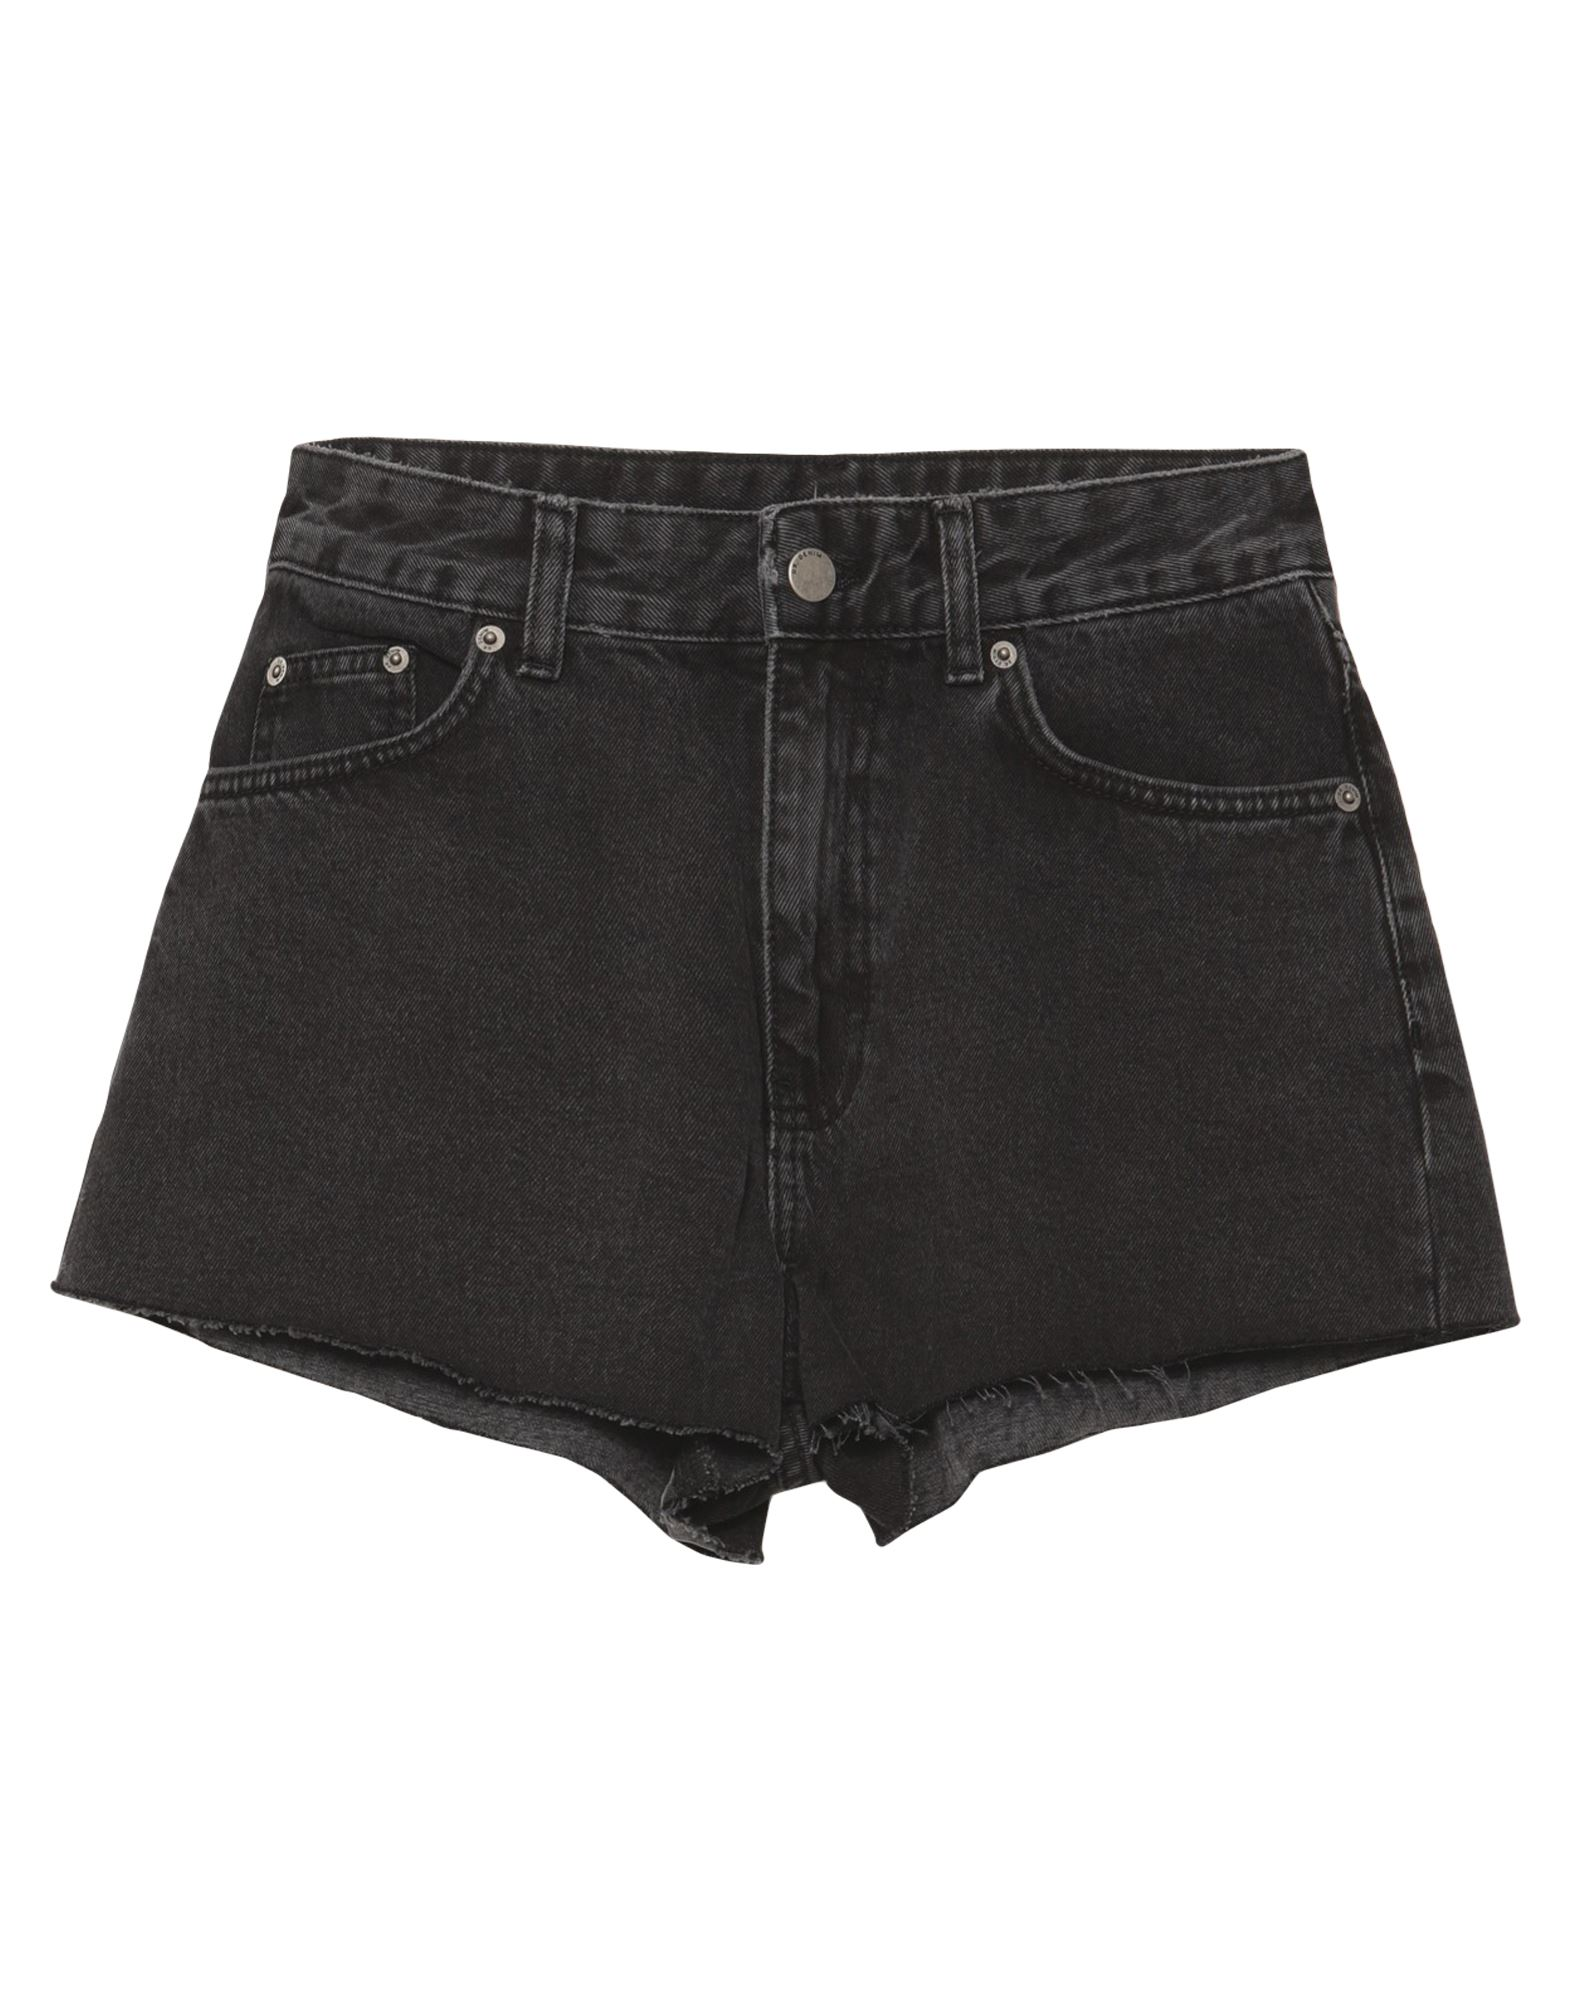 DR. DENIM JEANSMAKERS Джинсовые шорты dr denim jeansmakers комплект белья